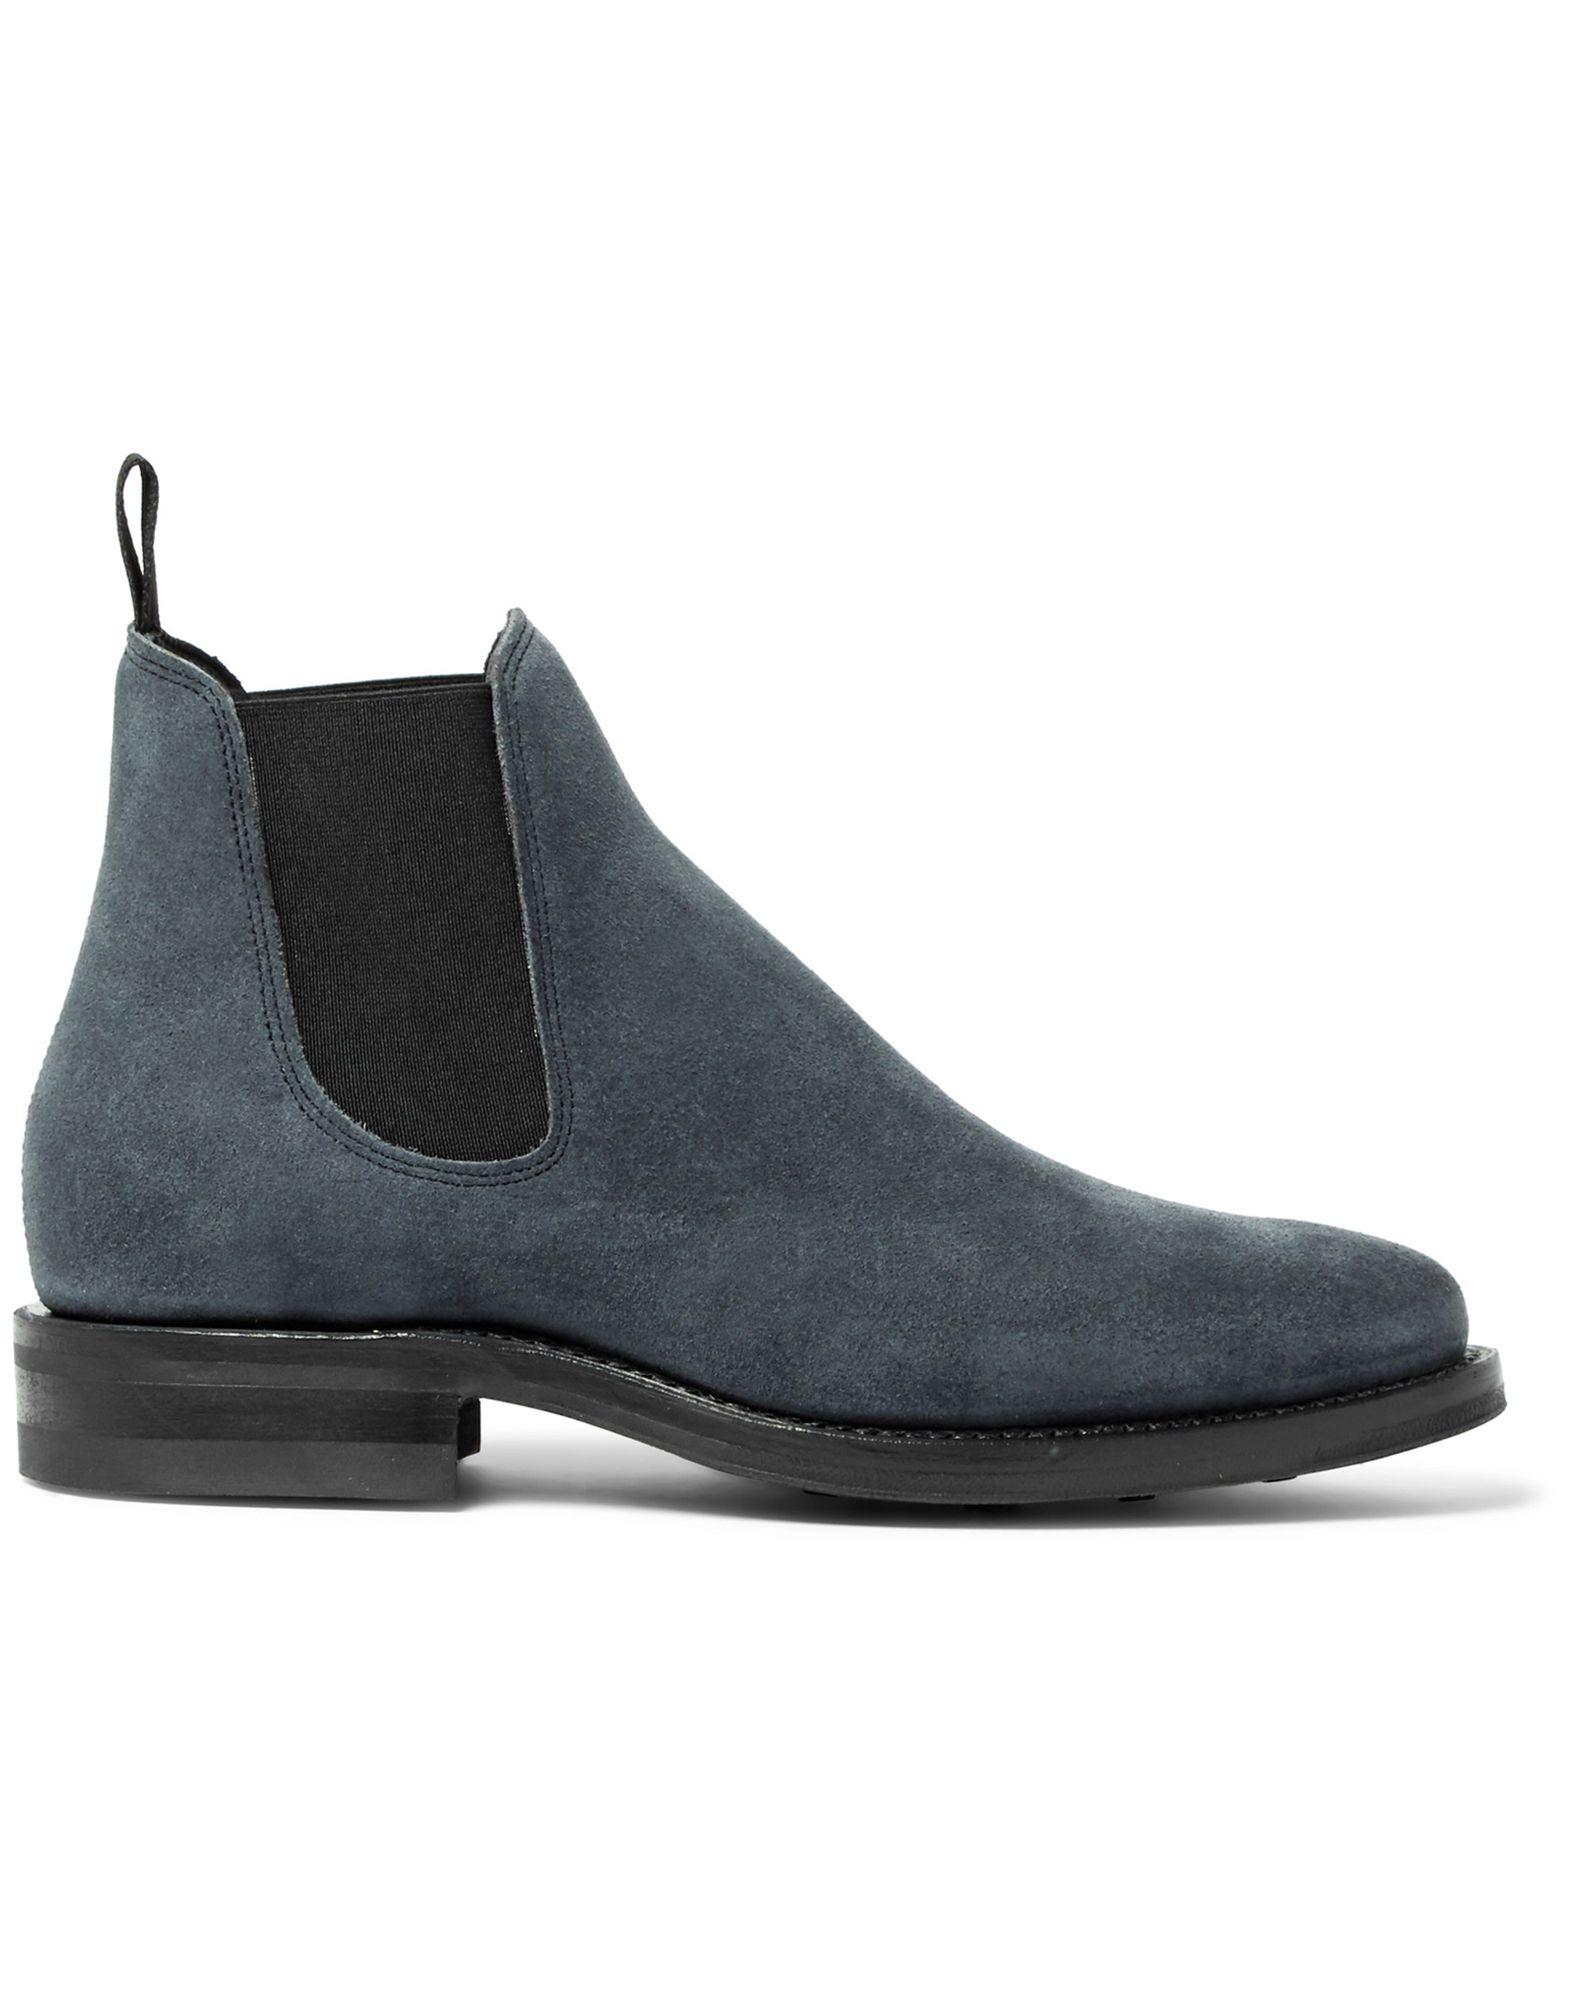 Viberg Gute Stiefelette Herren  11426705CJ Gute Viberg Qualität beliebte Schuhe fce464